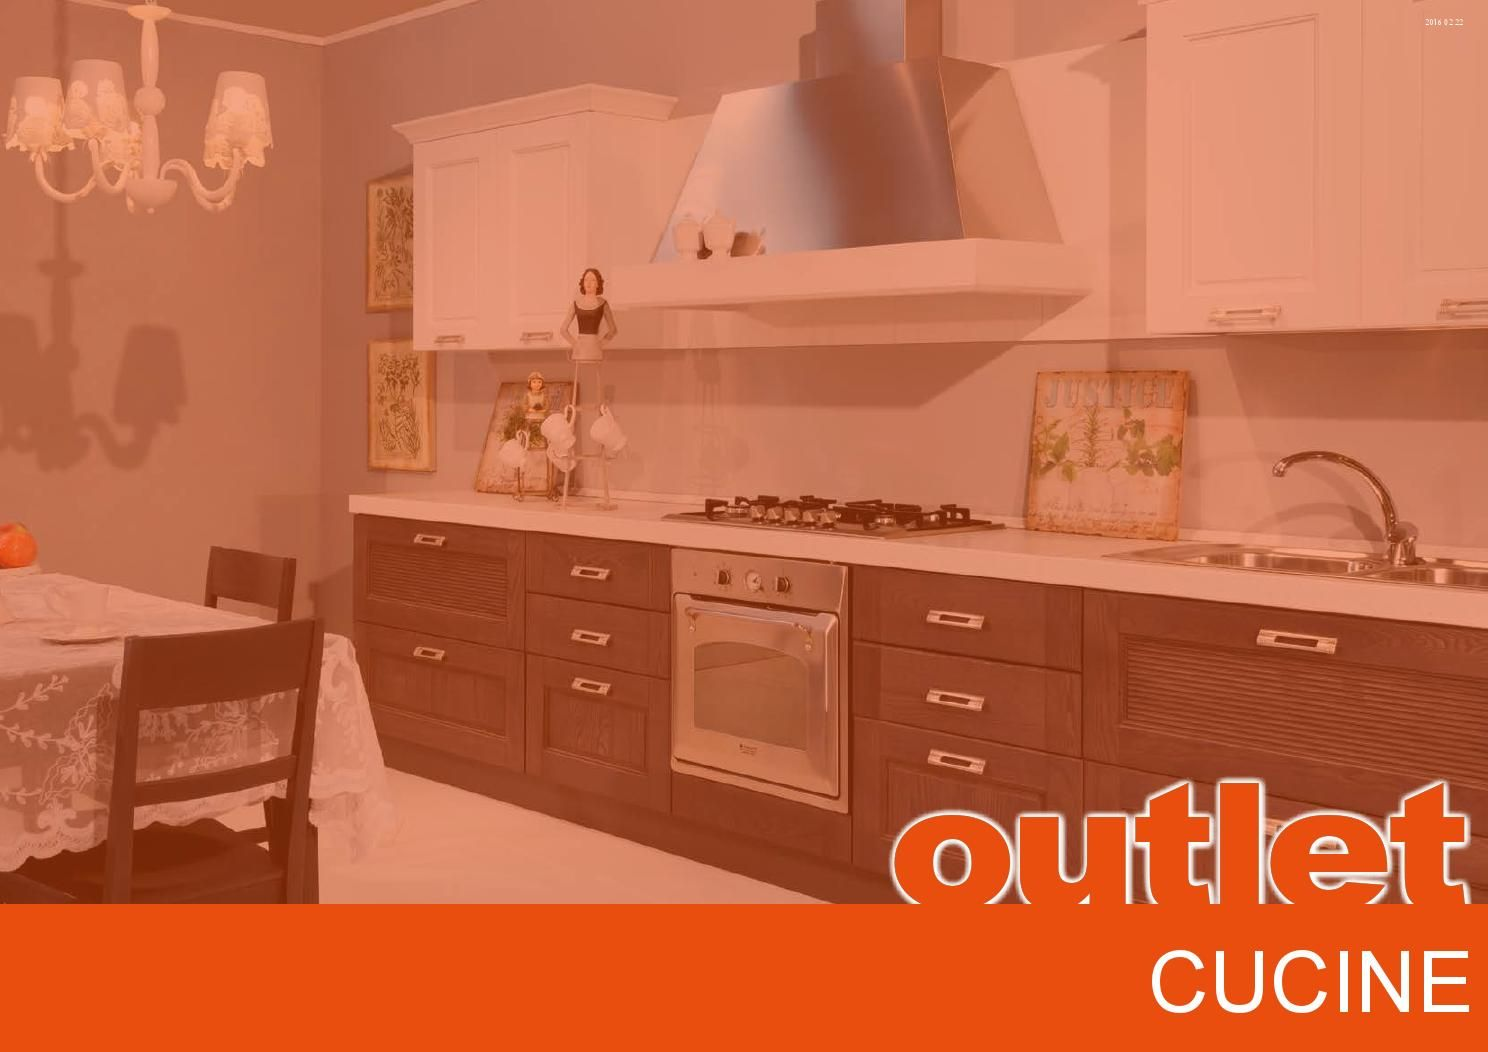 Asta Mobili Outlet Cucine | Outlets